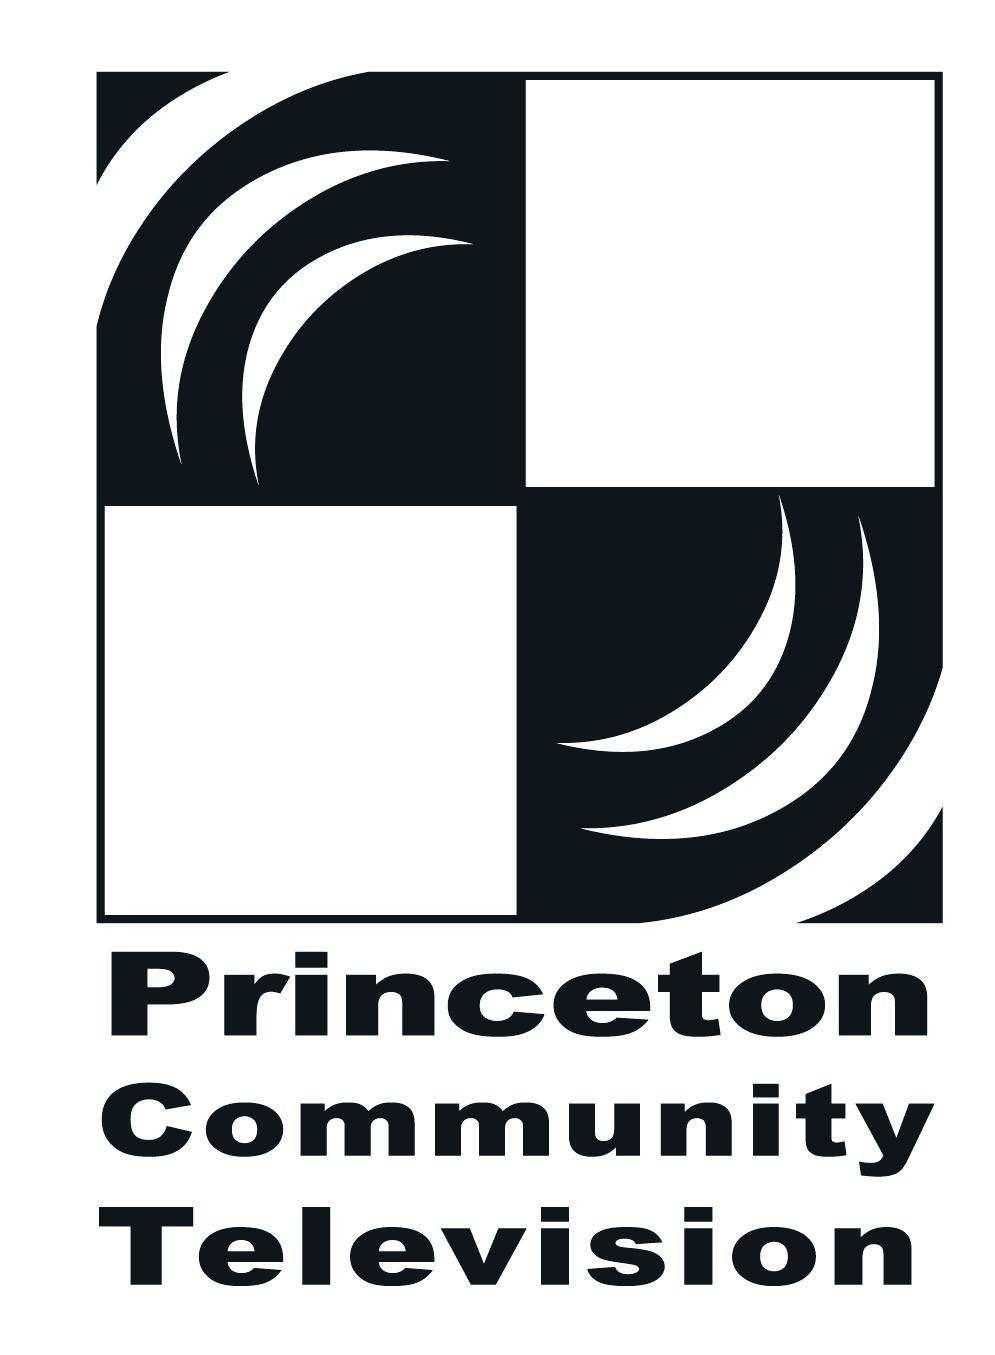 Princeton Community Television